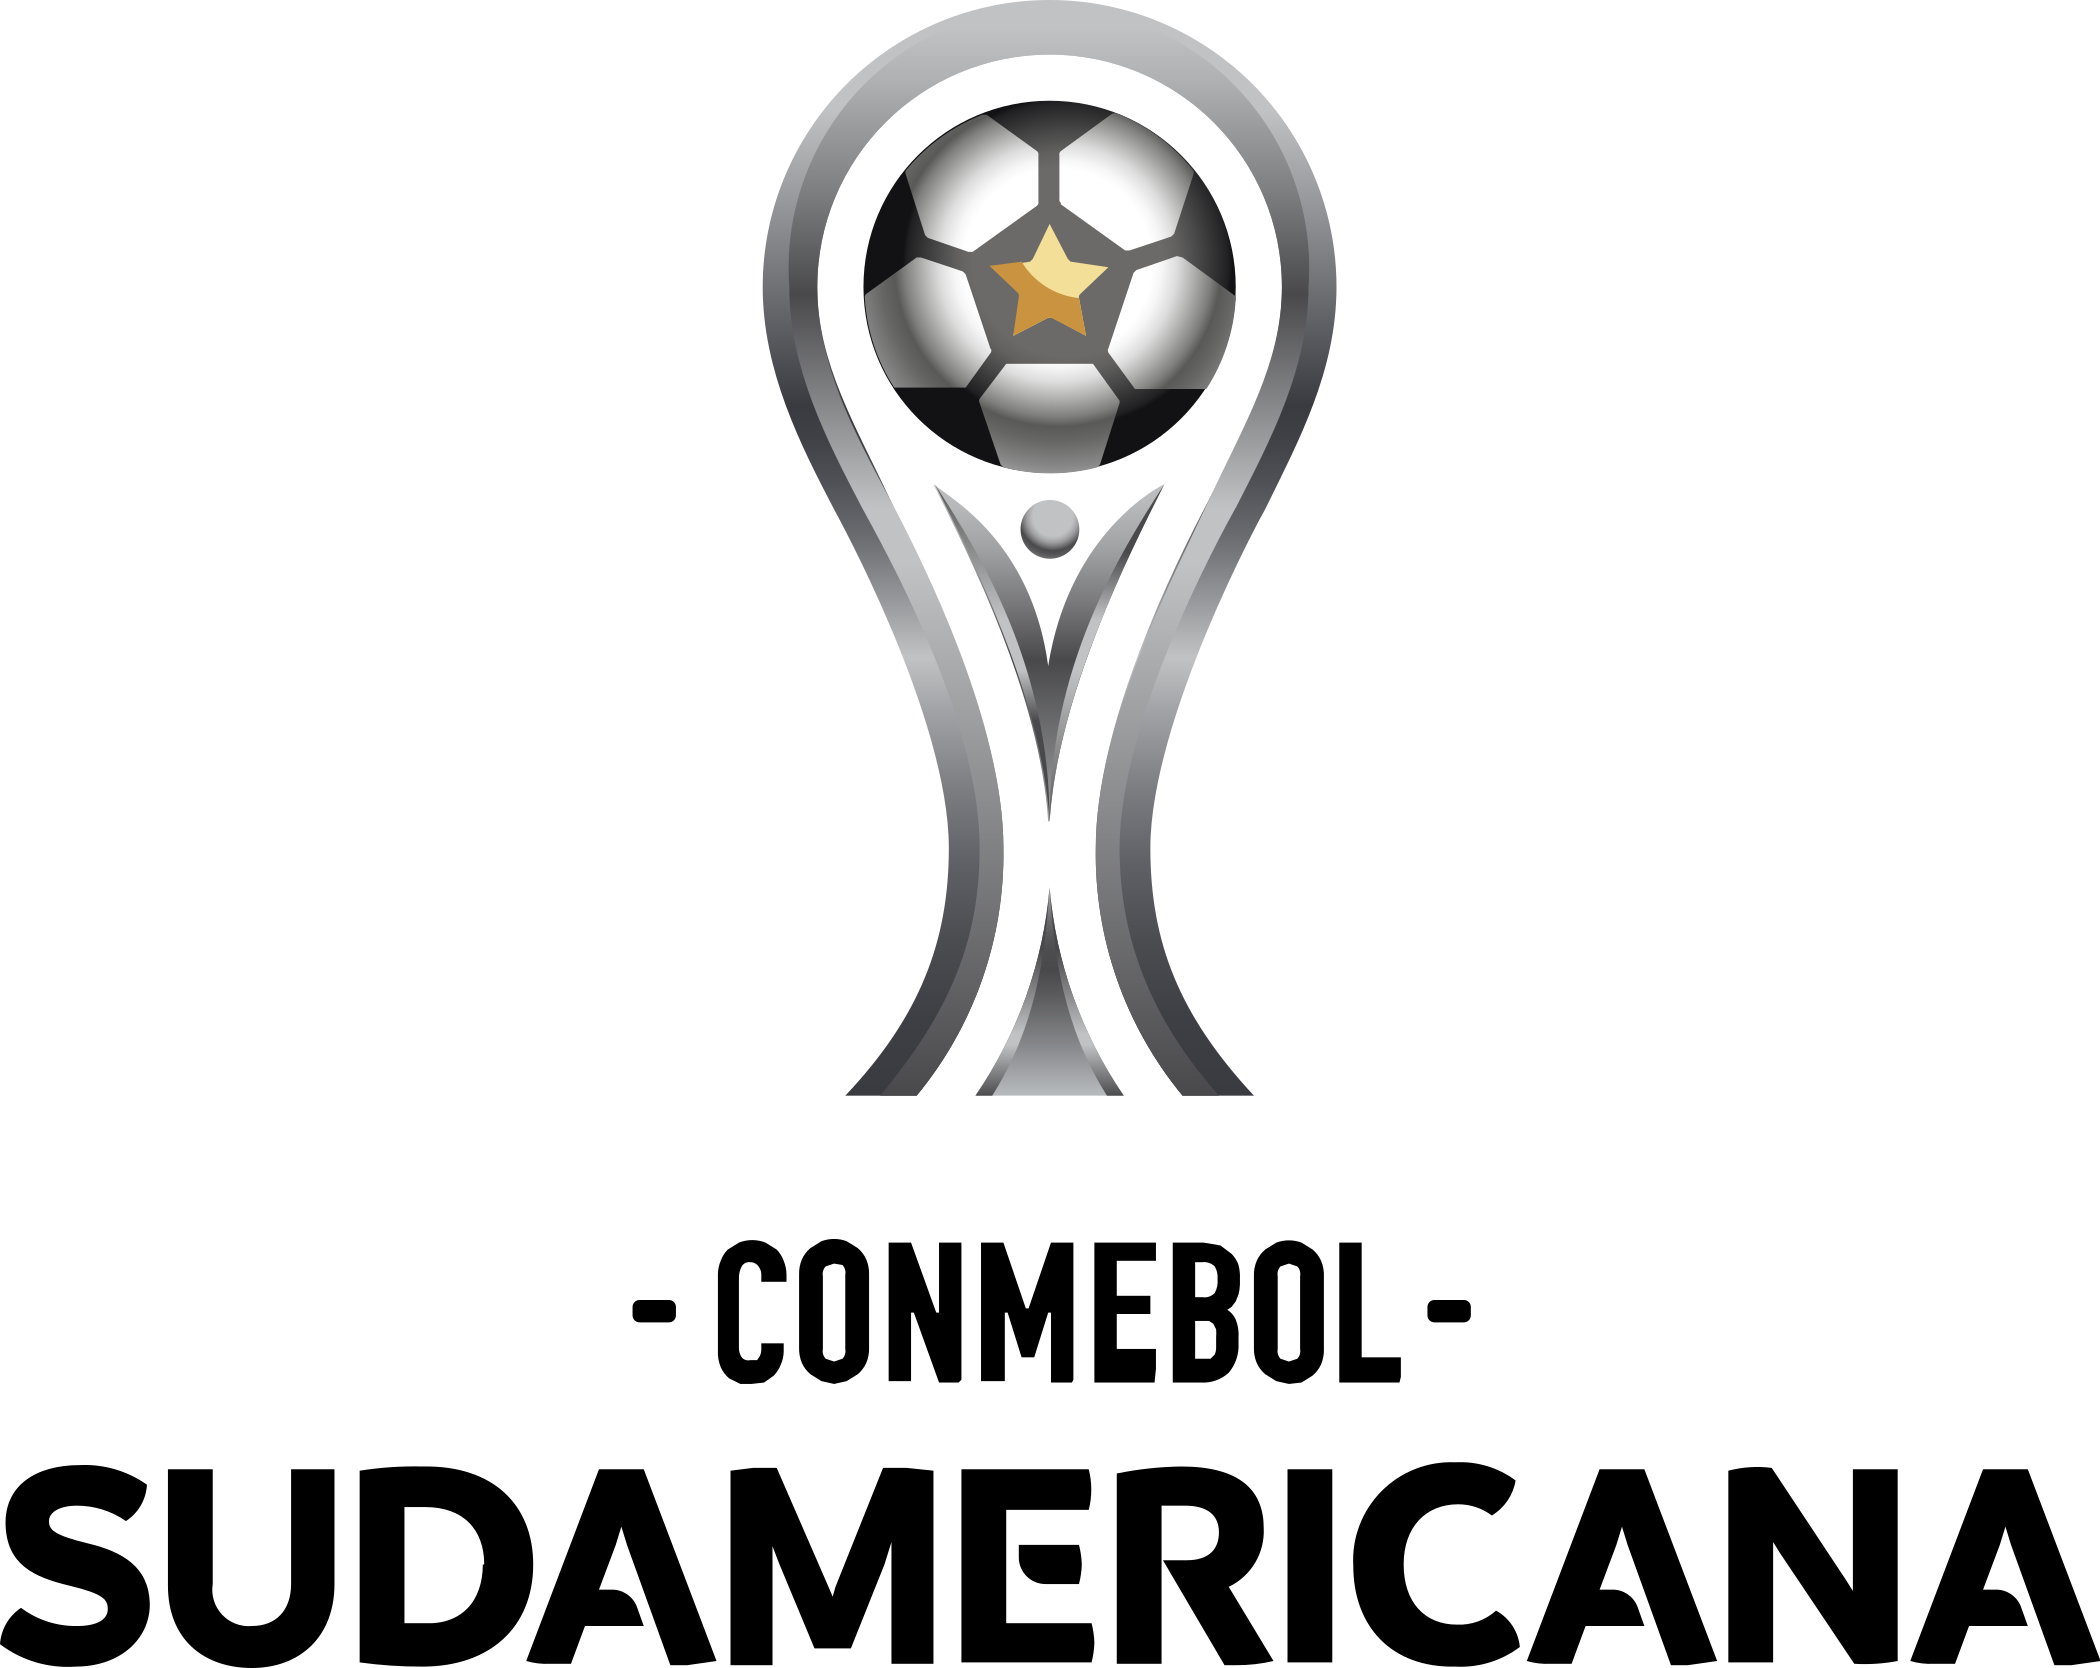 copa sulamericana logo 1 - Copa Sudamericana Logo